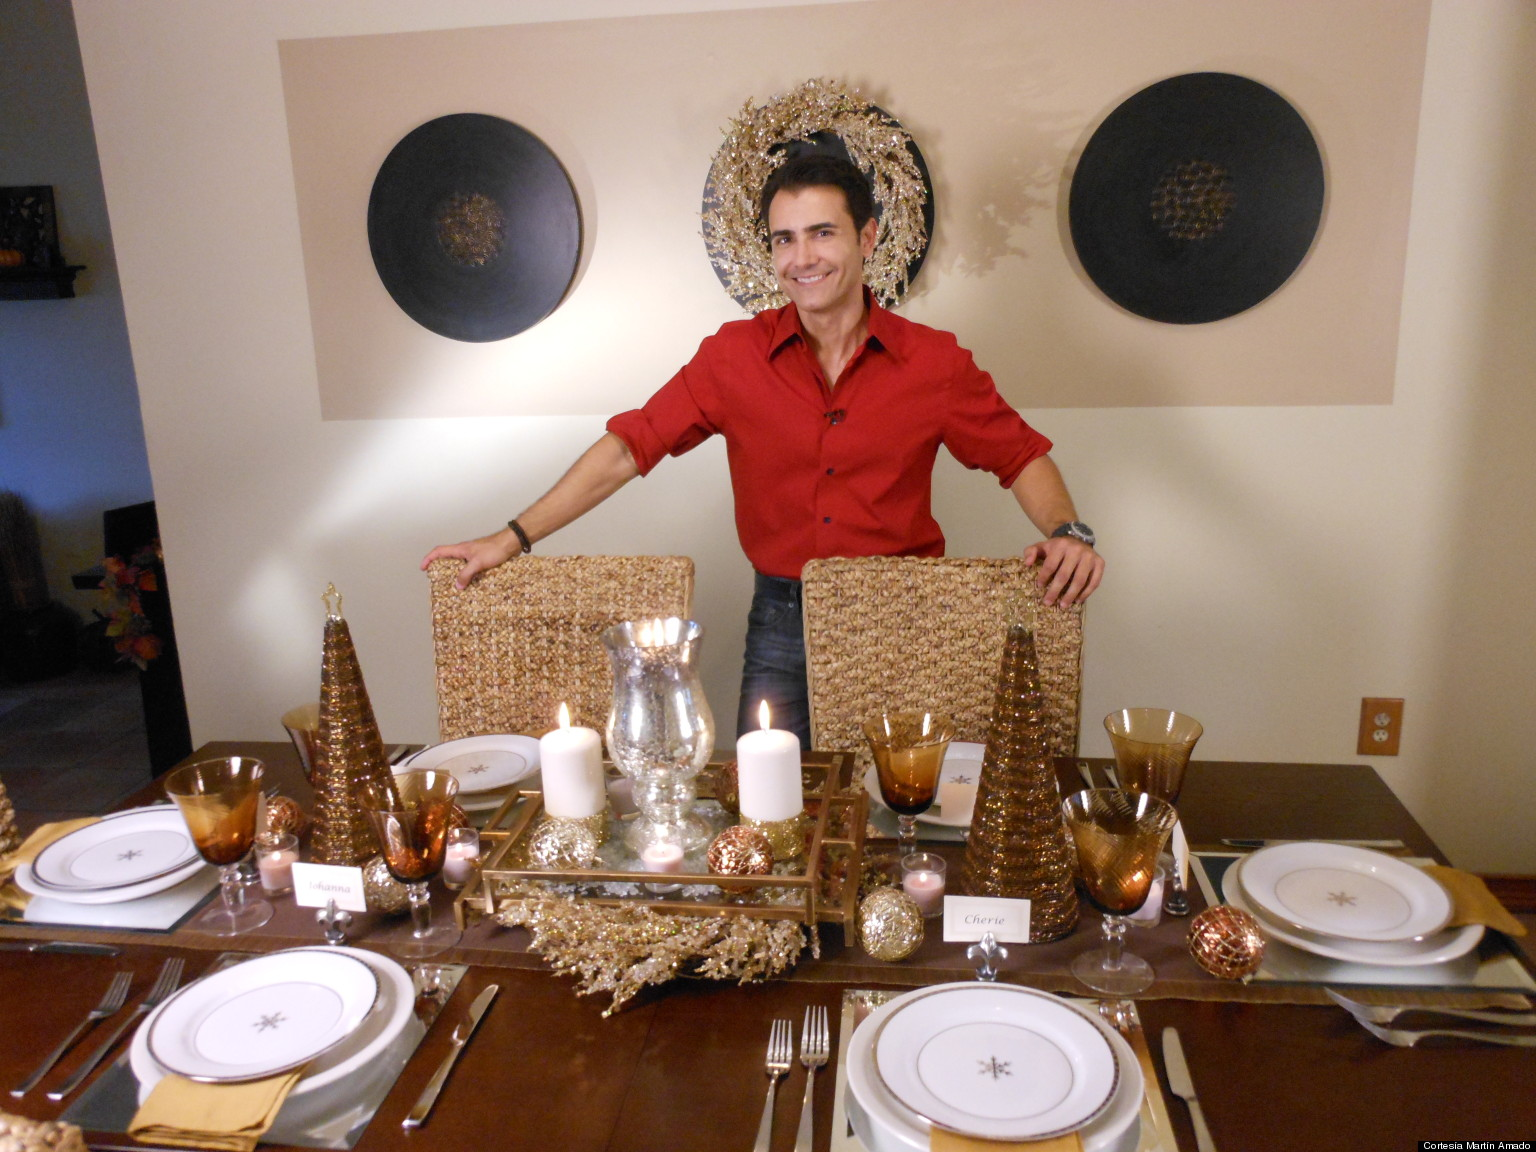 C mo decorar tu mesa para la cena de fin de a o fotos - Adornar mesa de navidad ...